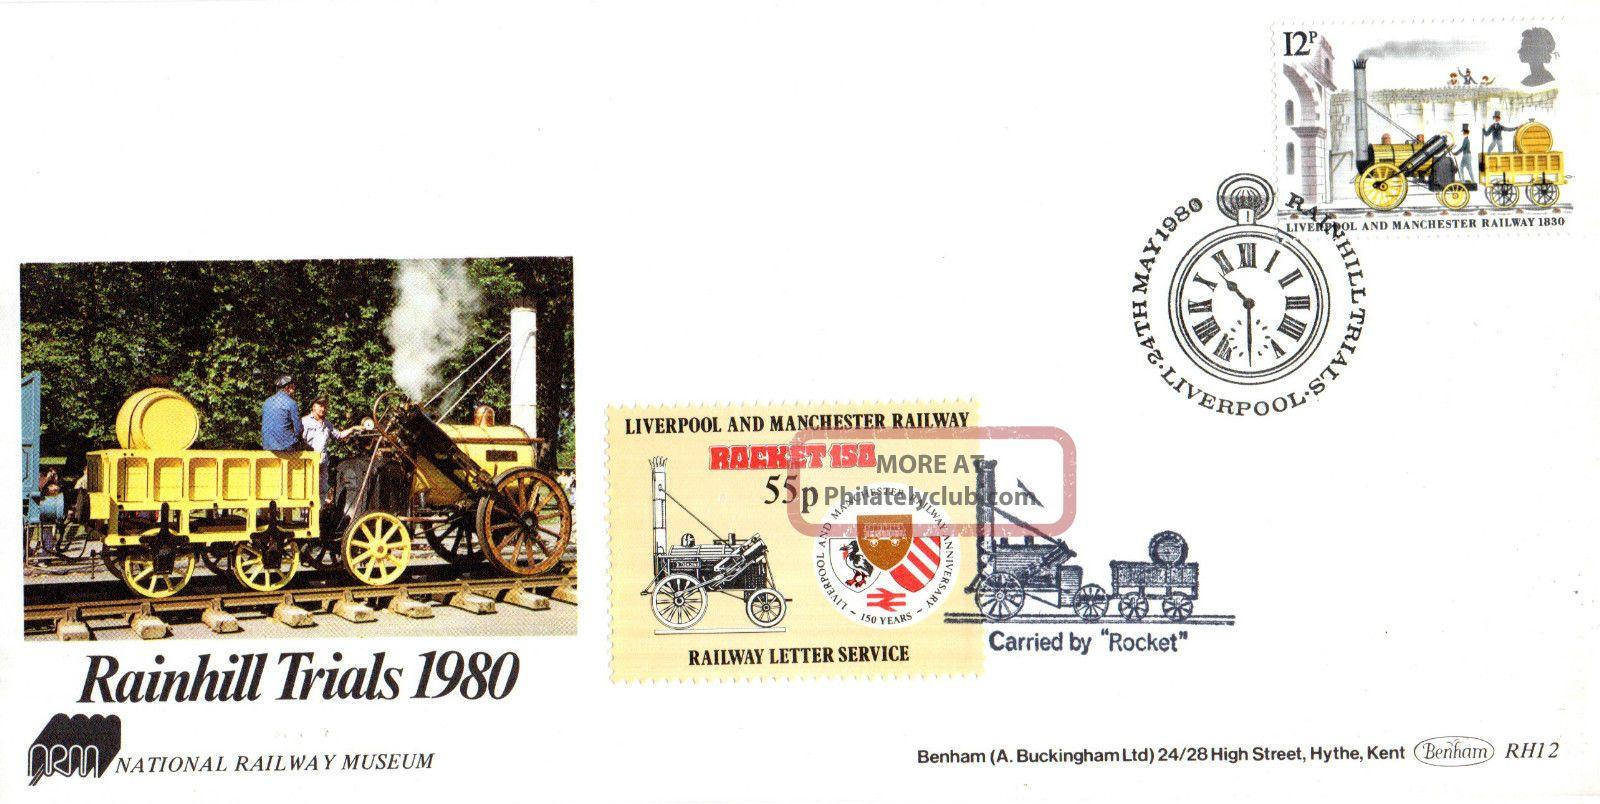 24 May 1980 Rainhill Trials Benham Rh 12 Commemorative Cover Liverpool Shs (a) Transportation photo